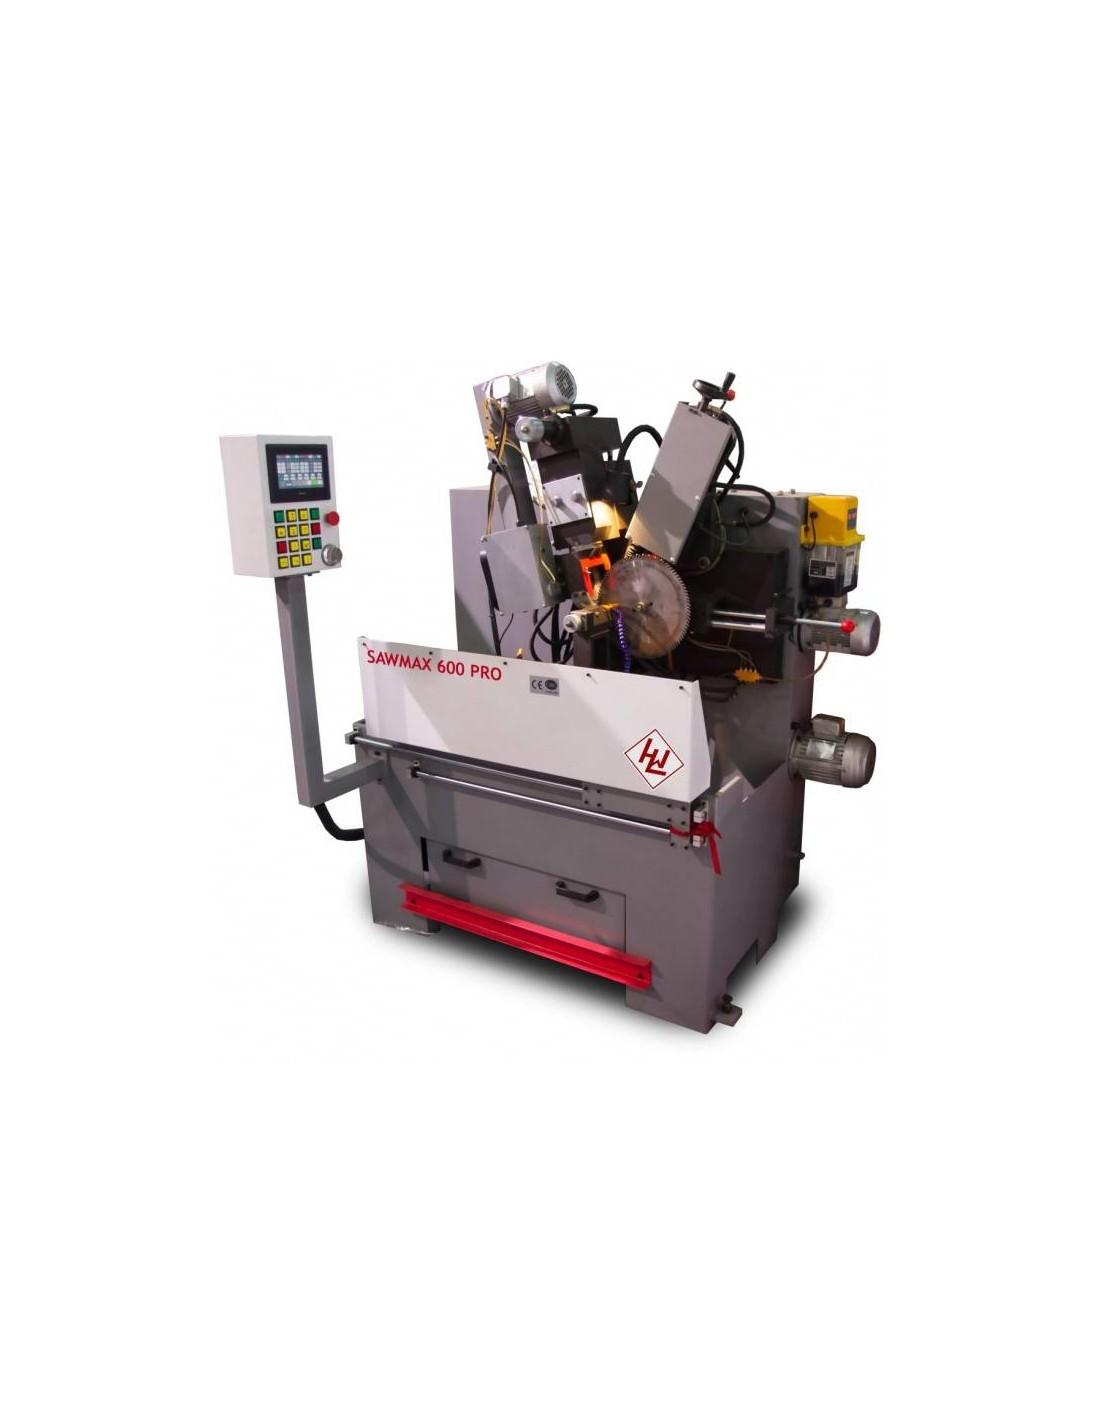 Masina pentru ascutit panze de circular Winter Sawmax 600 pro